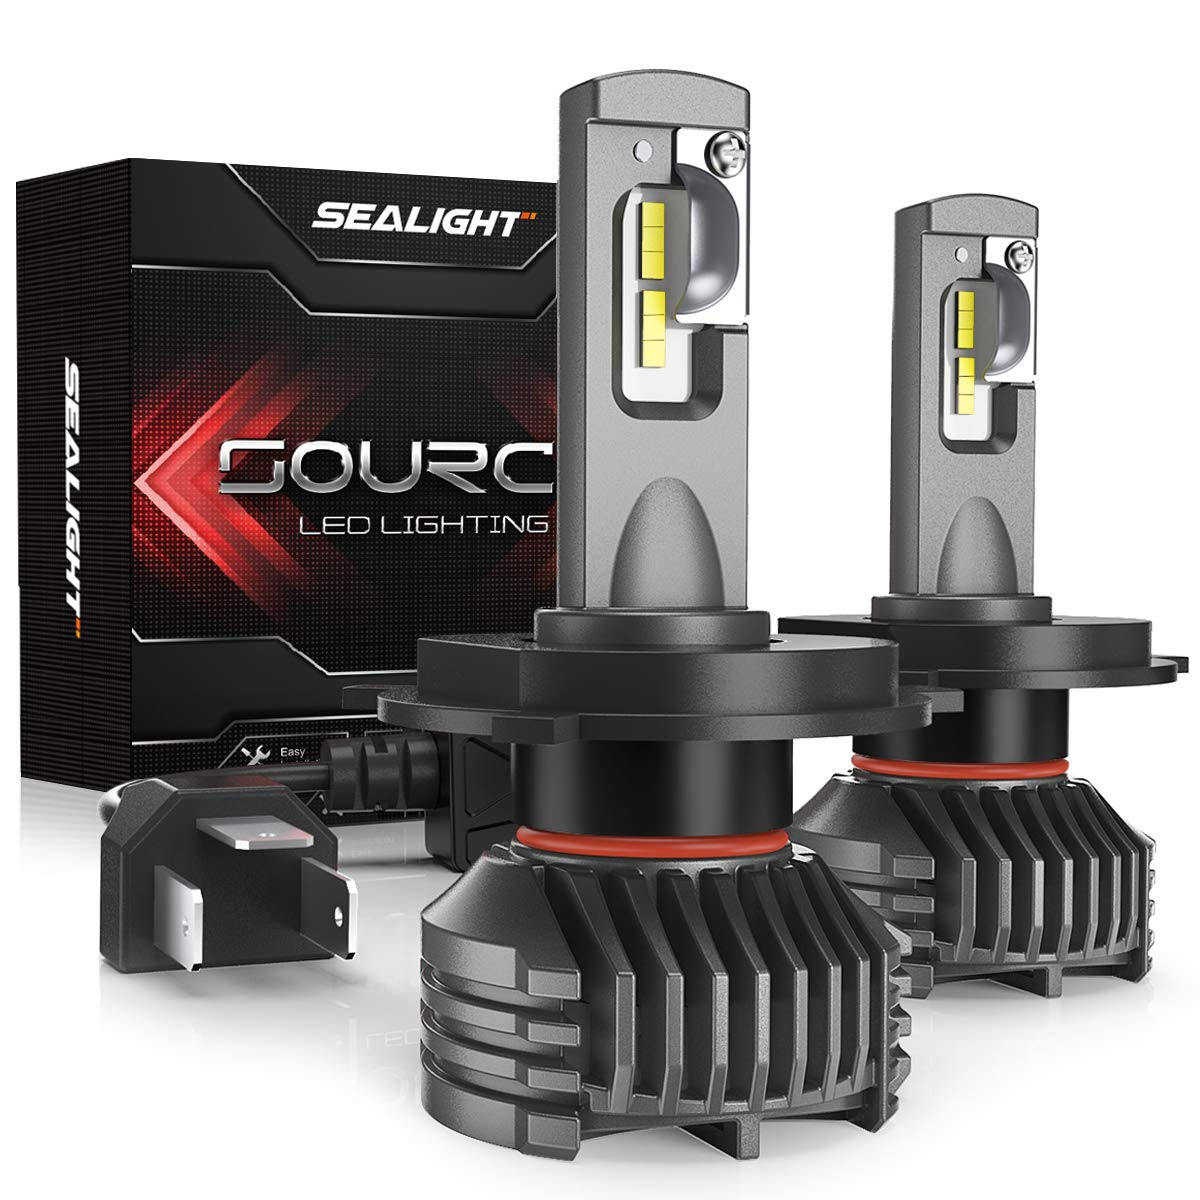 H4/9003 Hi/lo LED headlight bulbs 12,000 Lumen High Power 6000K SEALIGHT S3 Upgraded Series 3 Yr Warranty(2 Pack)